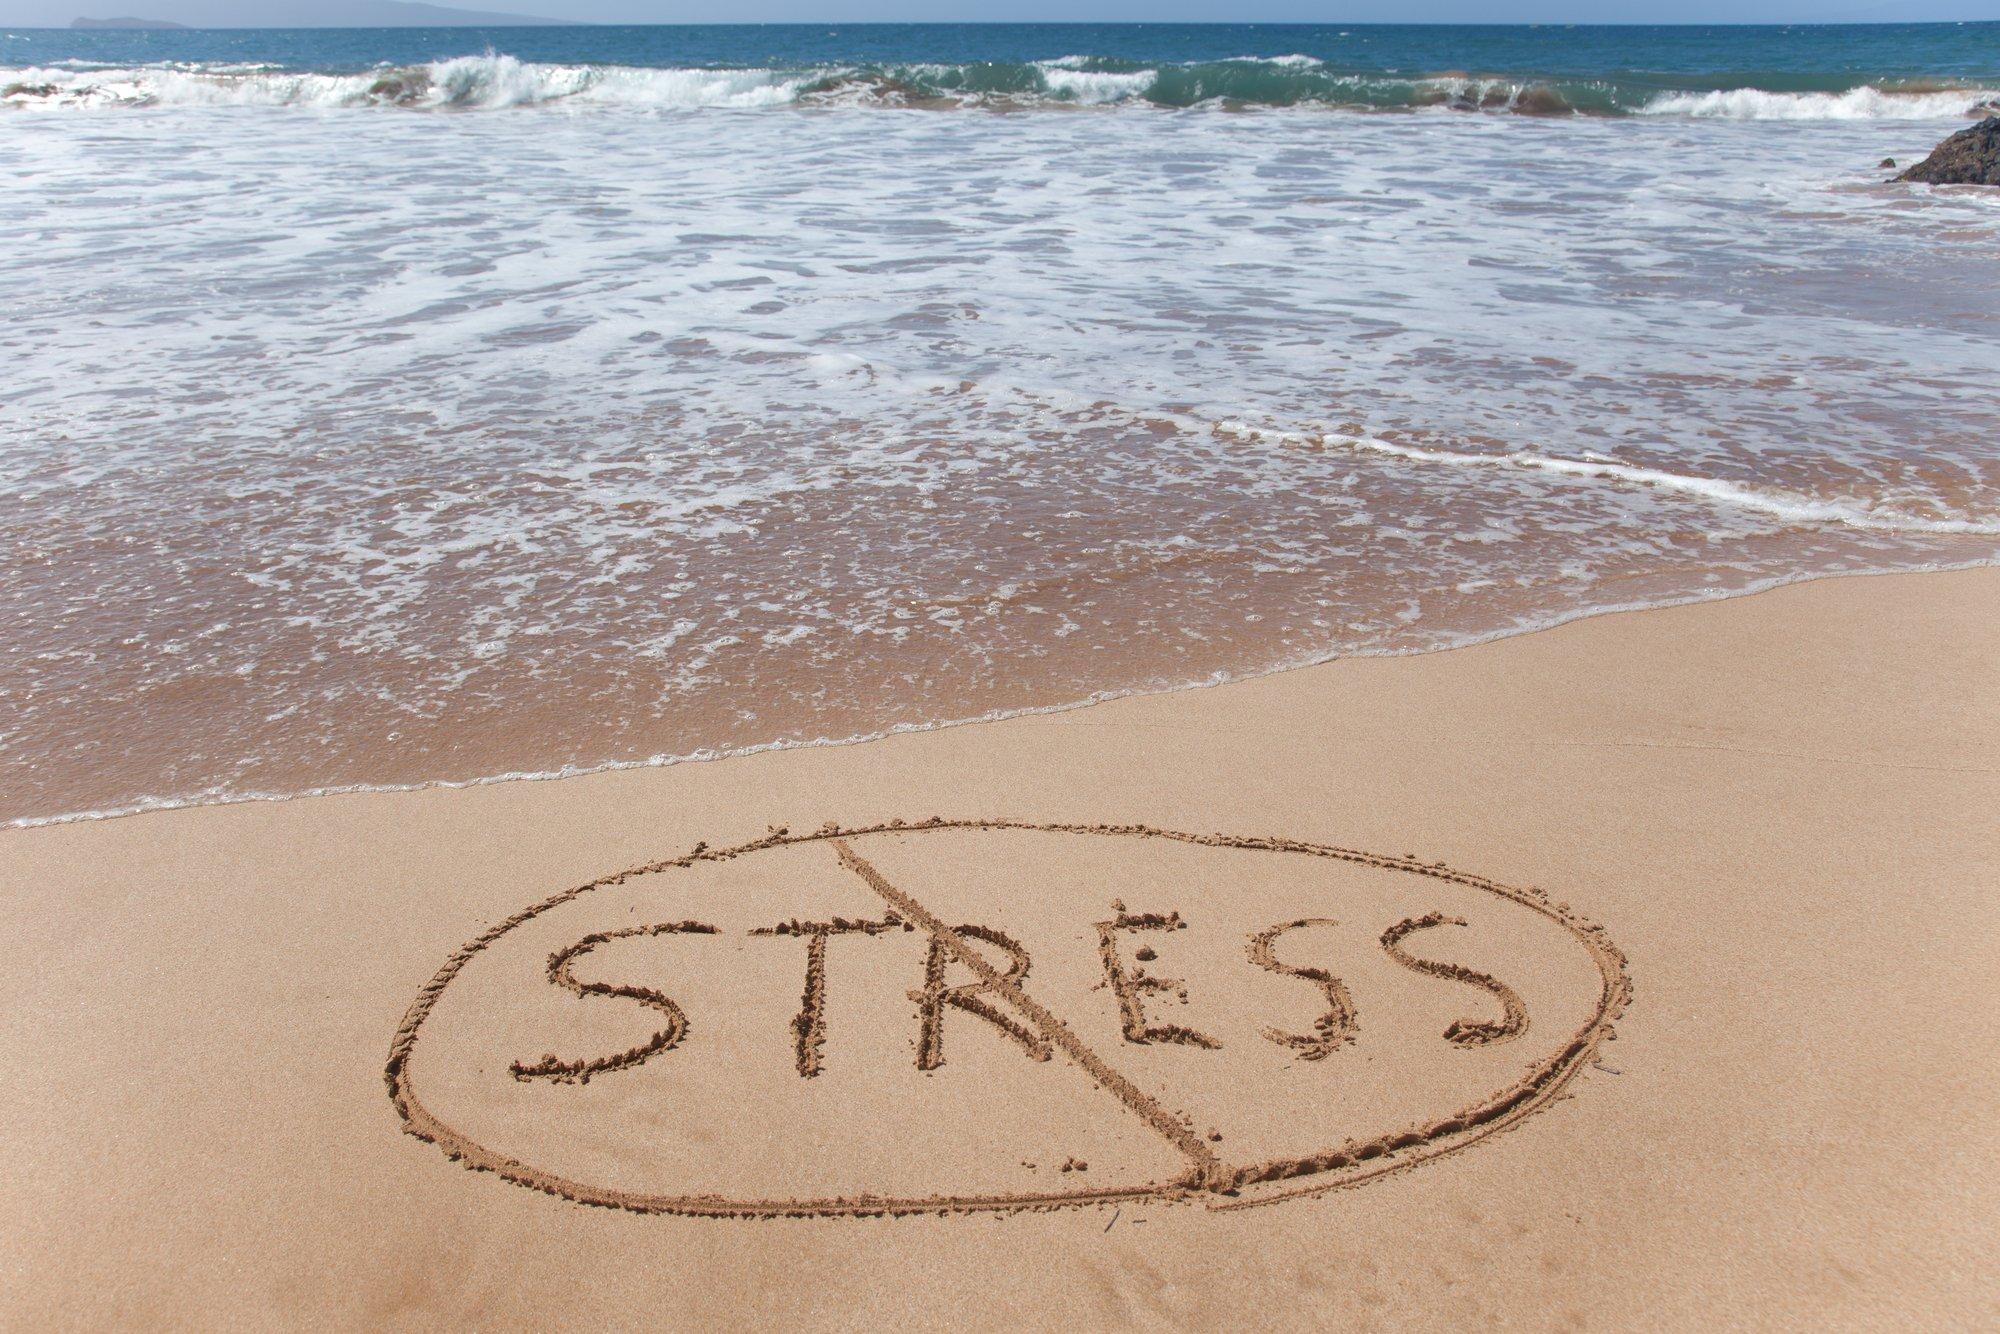 No stress! Written in sand on beach